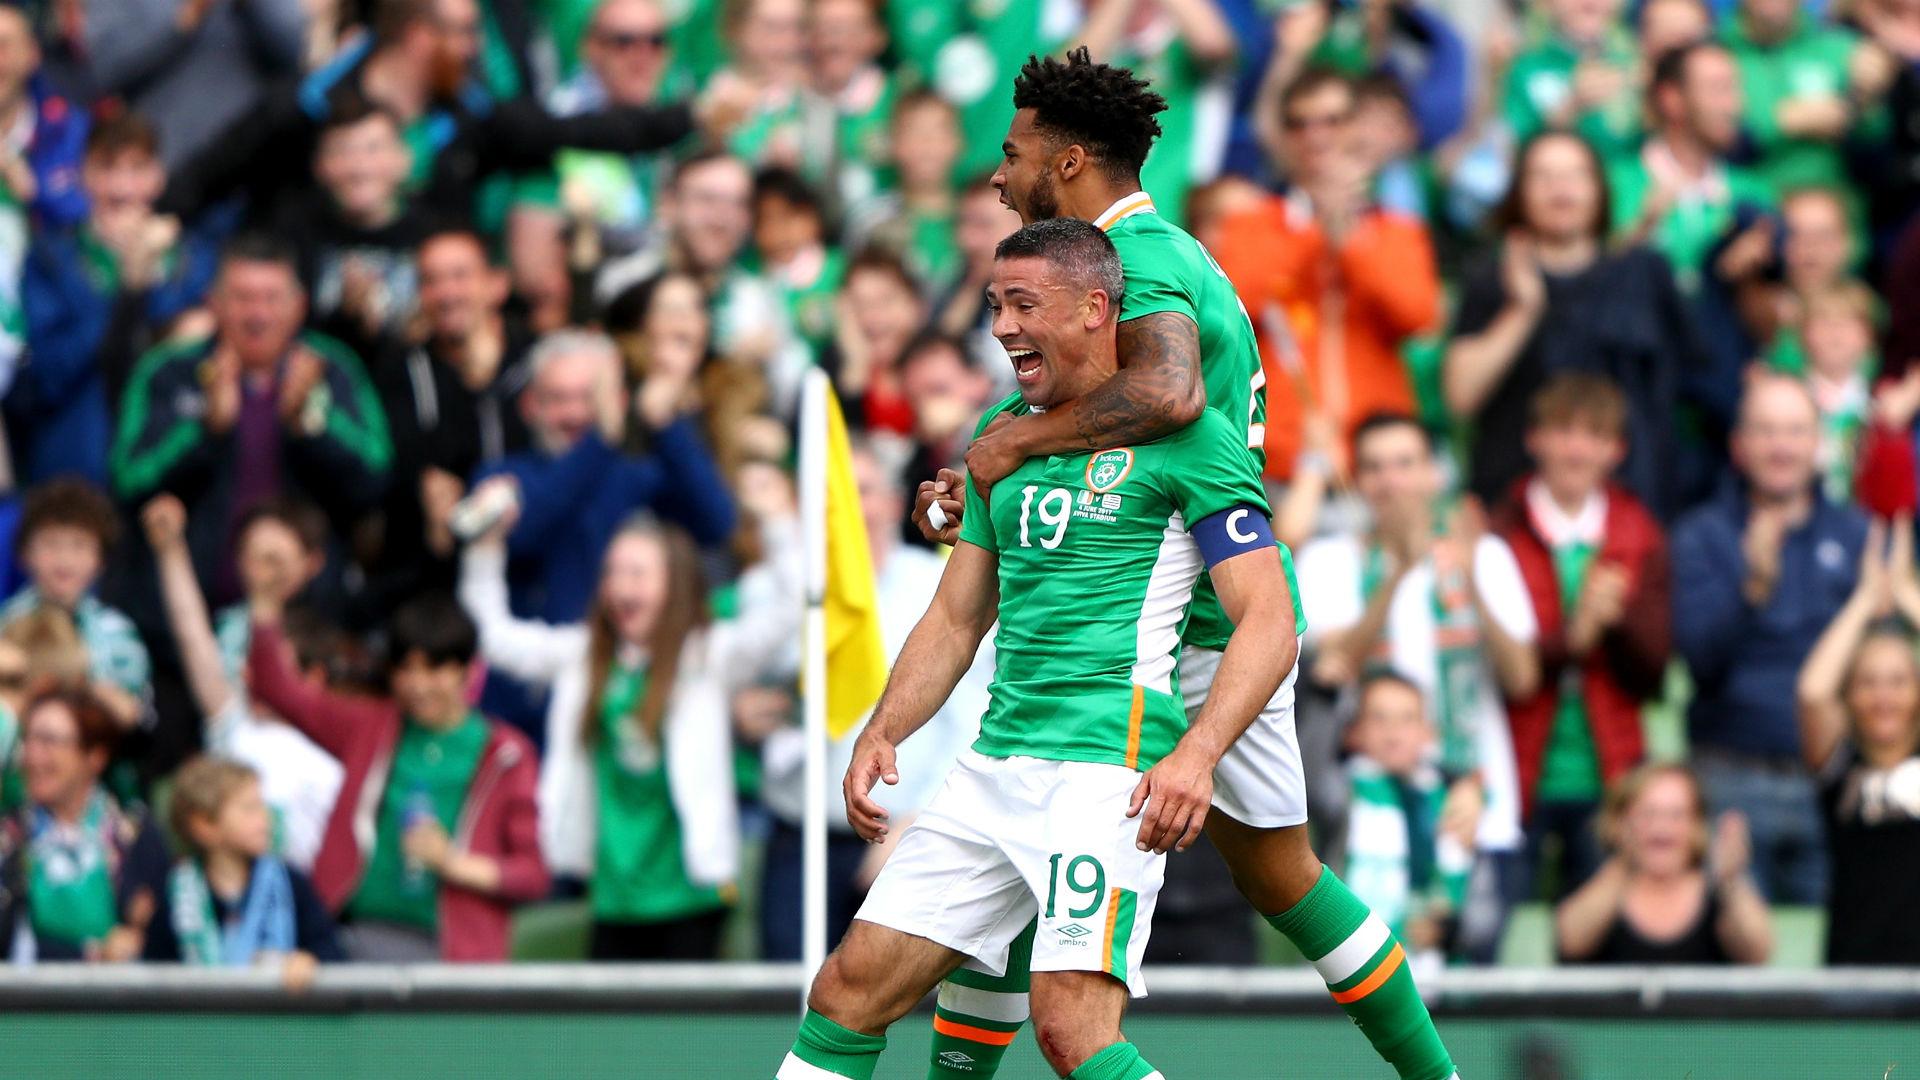 Jon Walters to captain Ireland against Uruguay